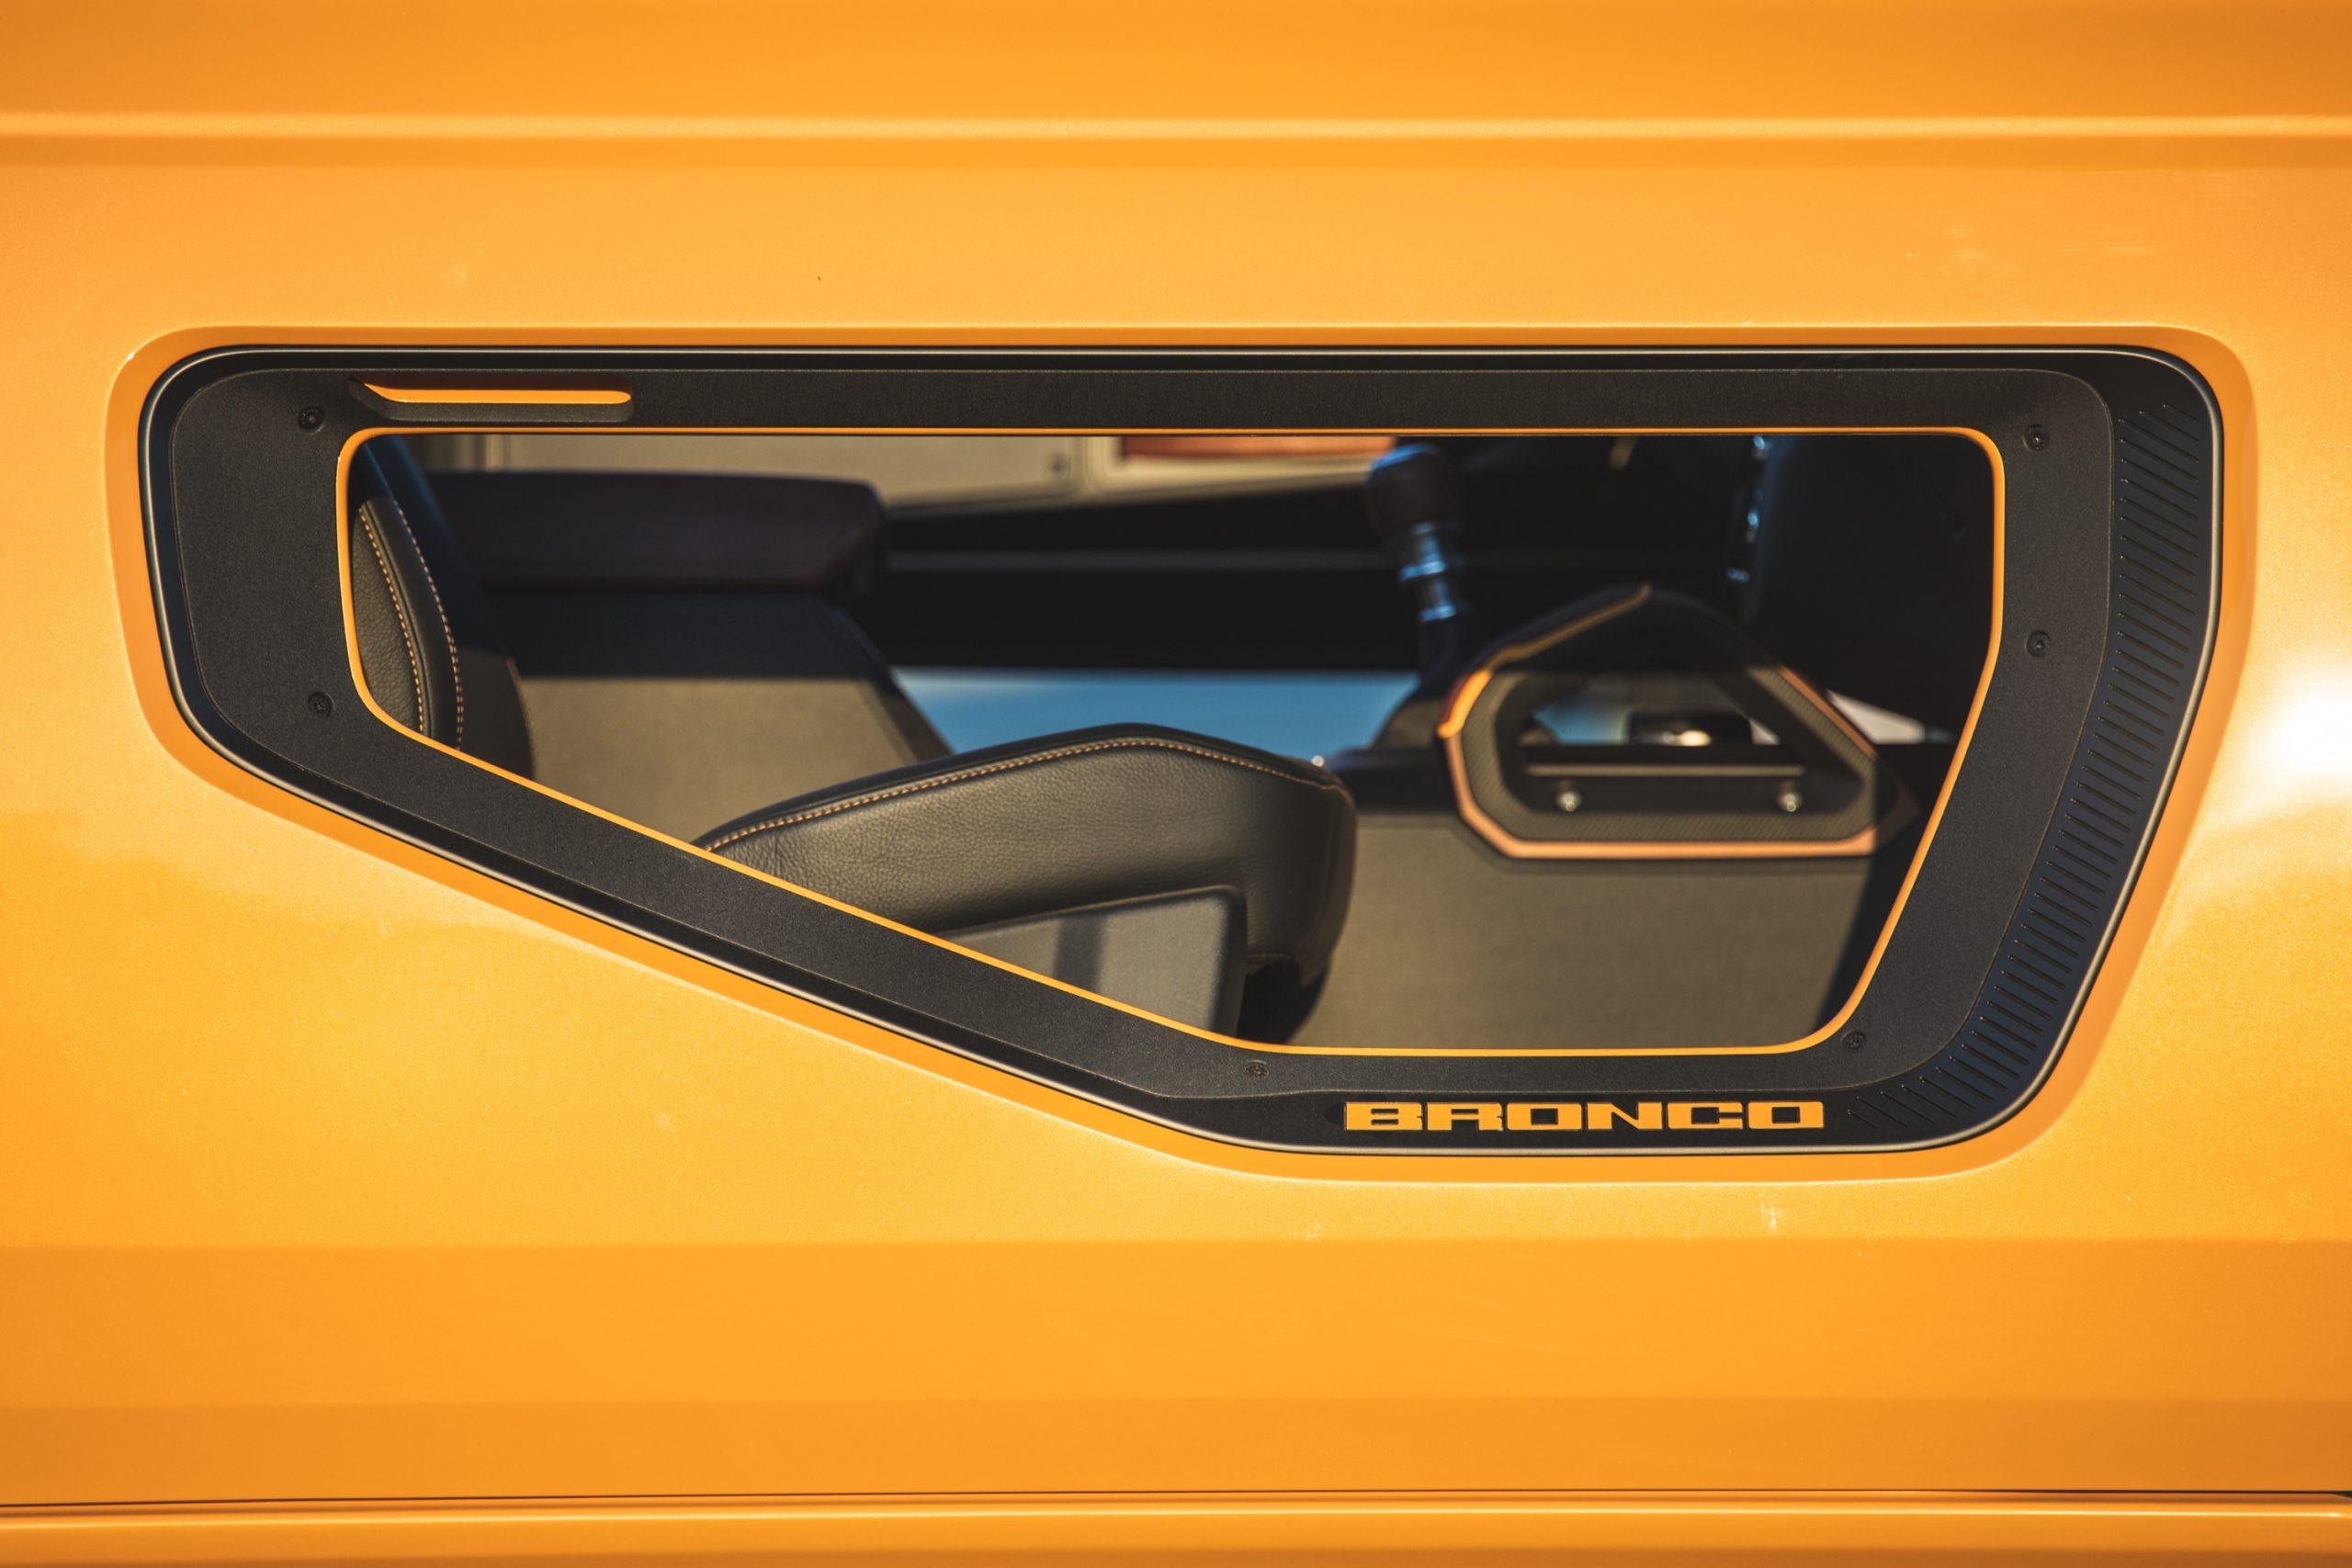 2021 Ford Bronco Two Door Skeleton Design